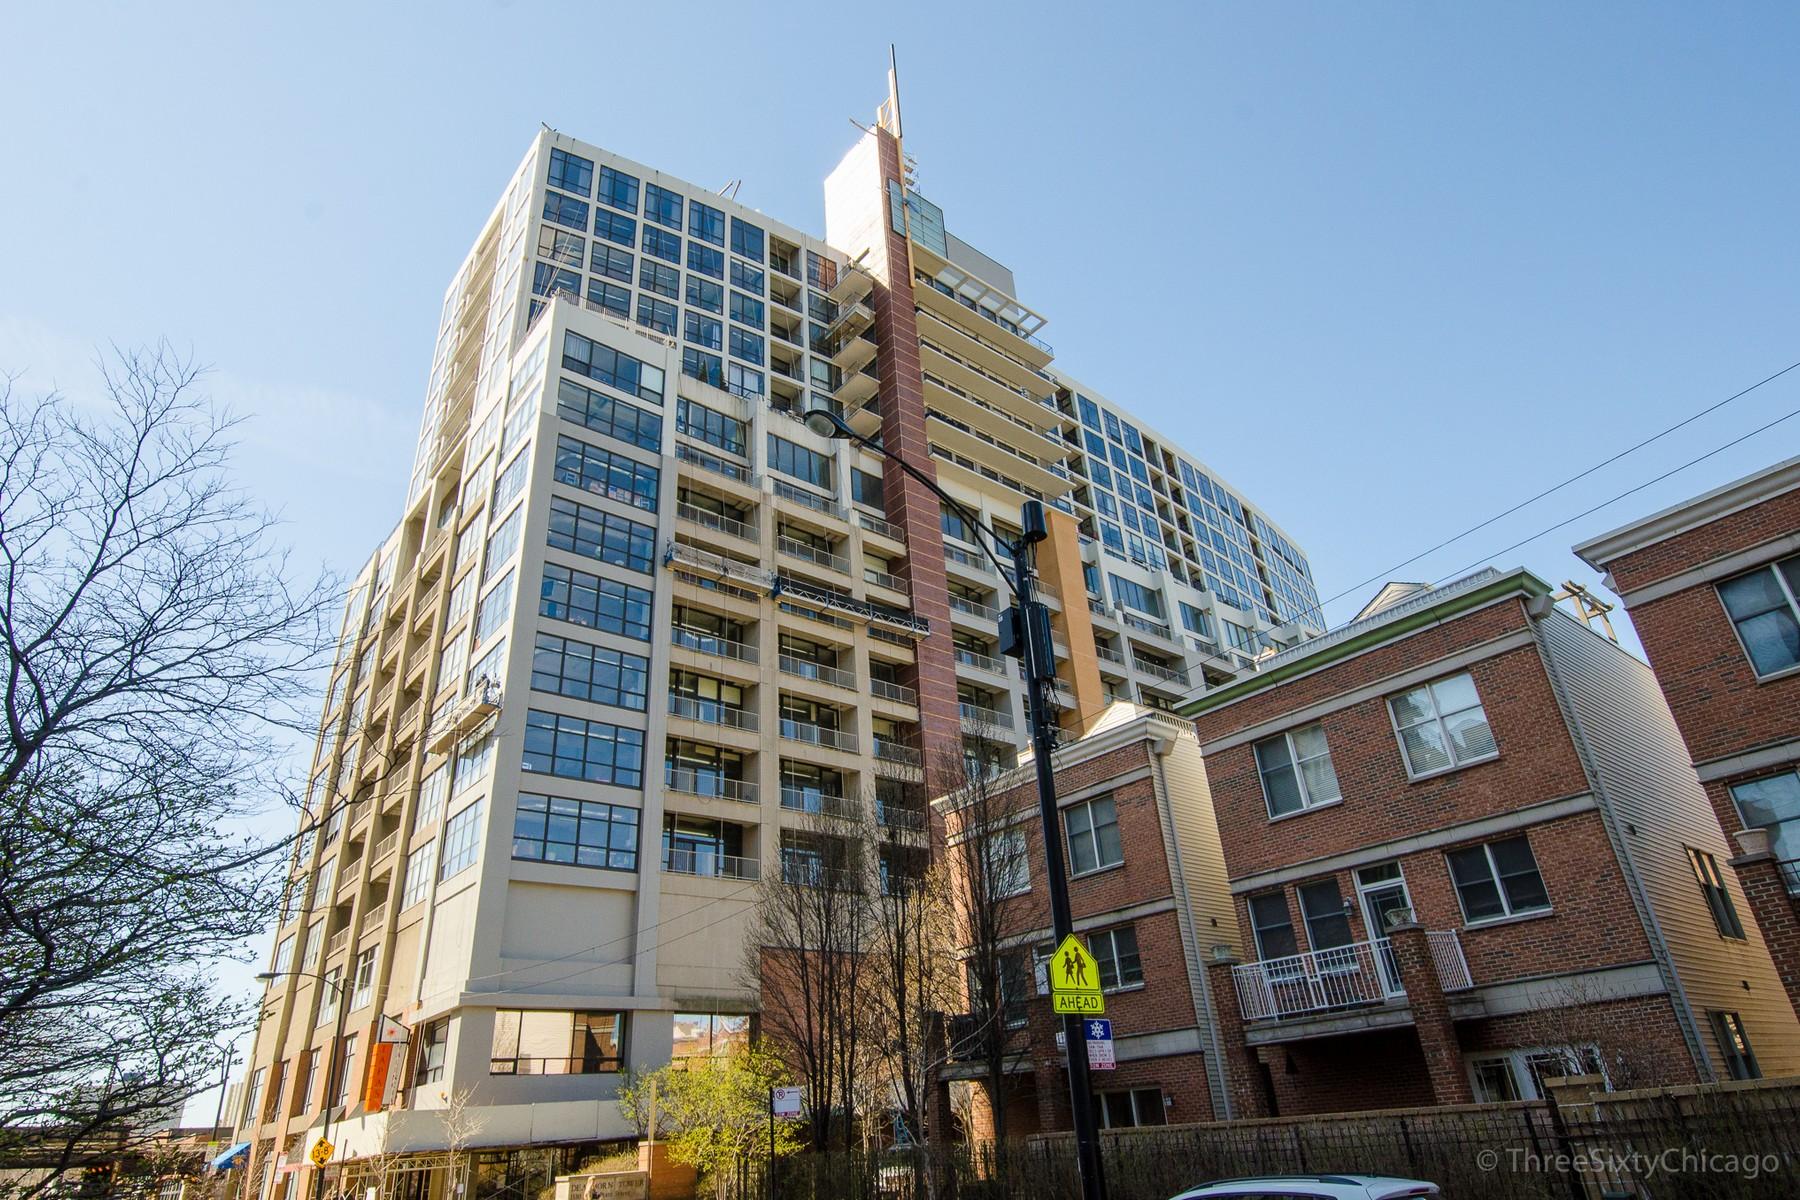 Condomínio para Venda às Dearborn Tower 1530 S. State Street, Unit 1005 Chicago, Illinois, 60605 Estados Unidos